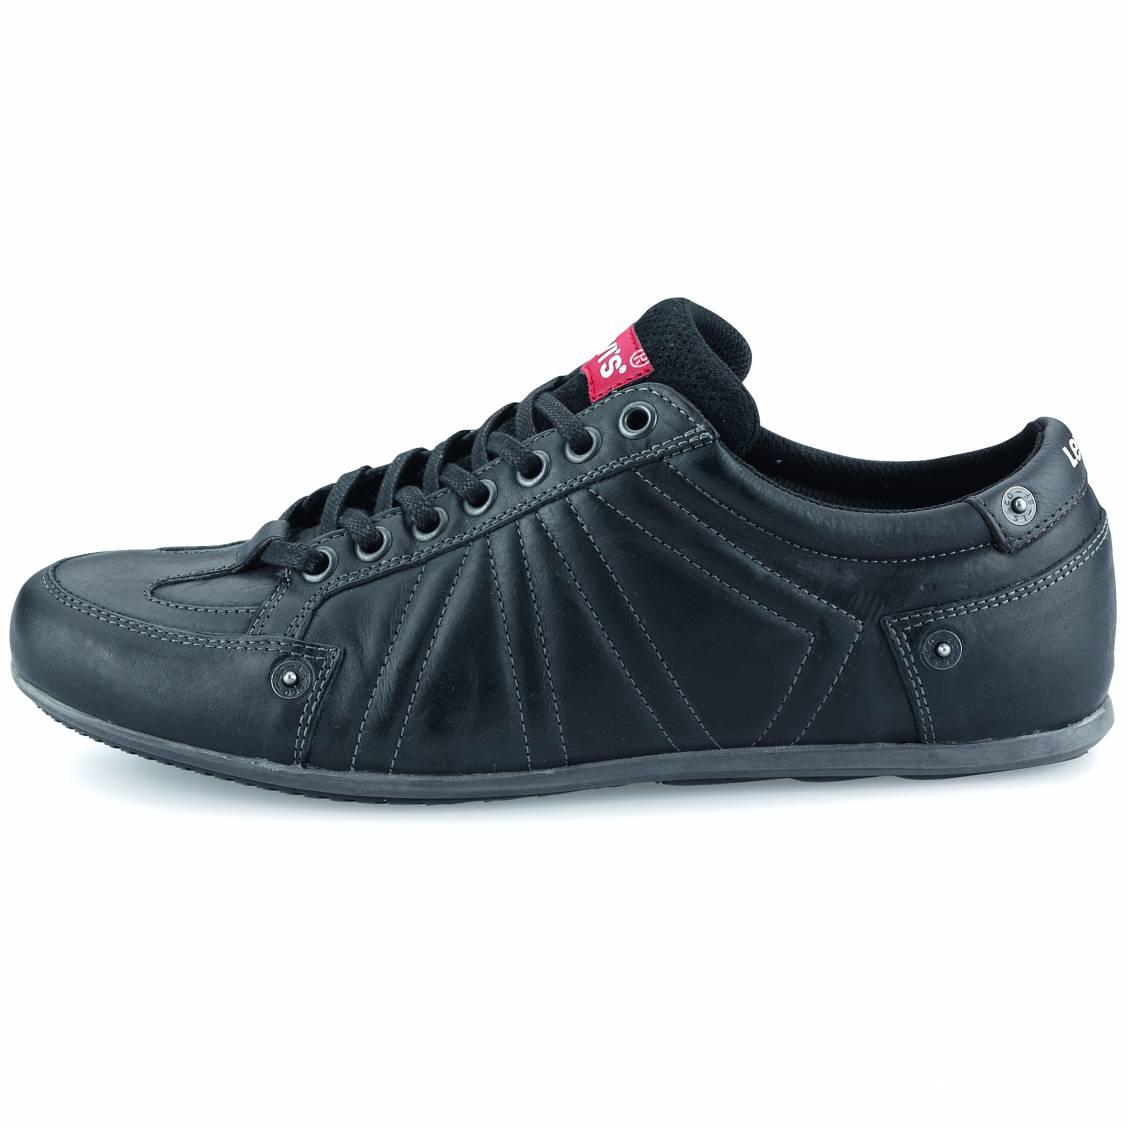 chaussures homme levi s en cuir noir. Black Bedroom Furniture Sets. Home Design Ideas